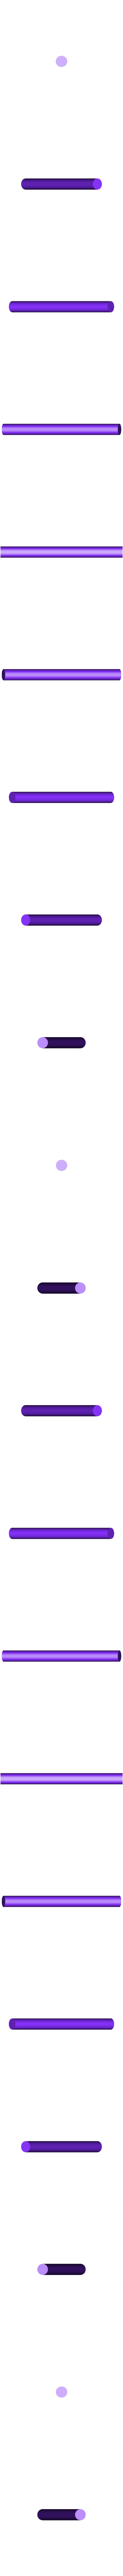 Post.stl Download free STL file Bobble Head • Model to 3D print, wjordan819